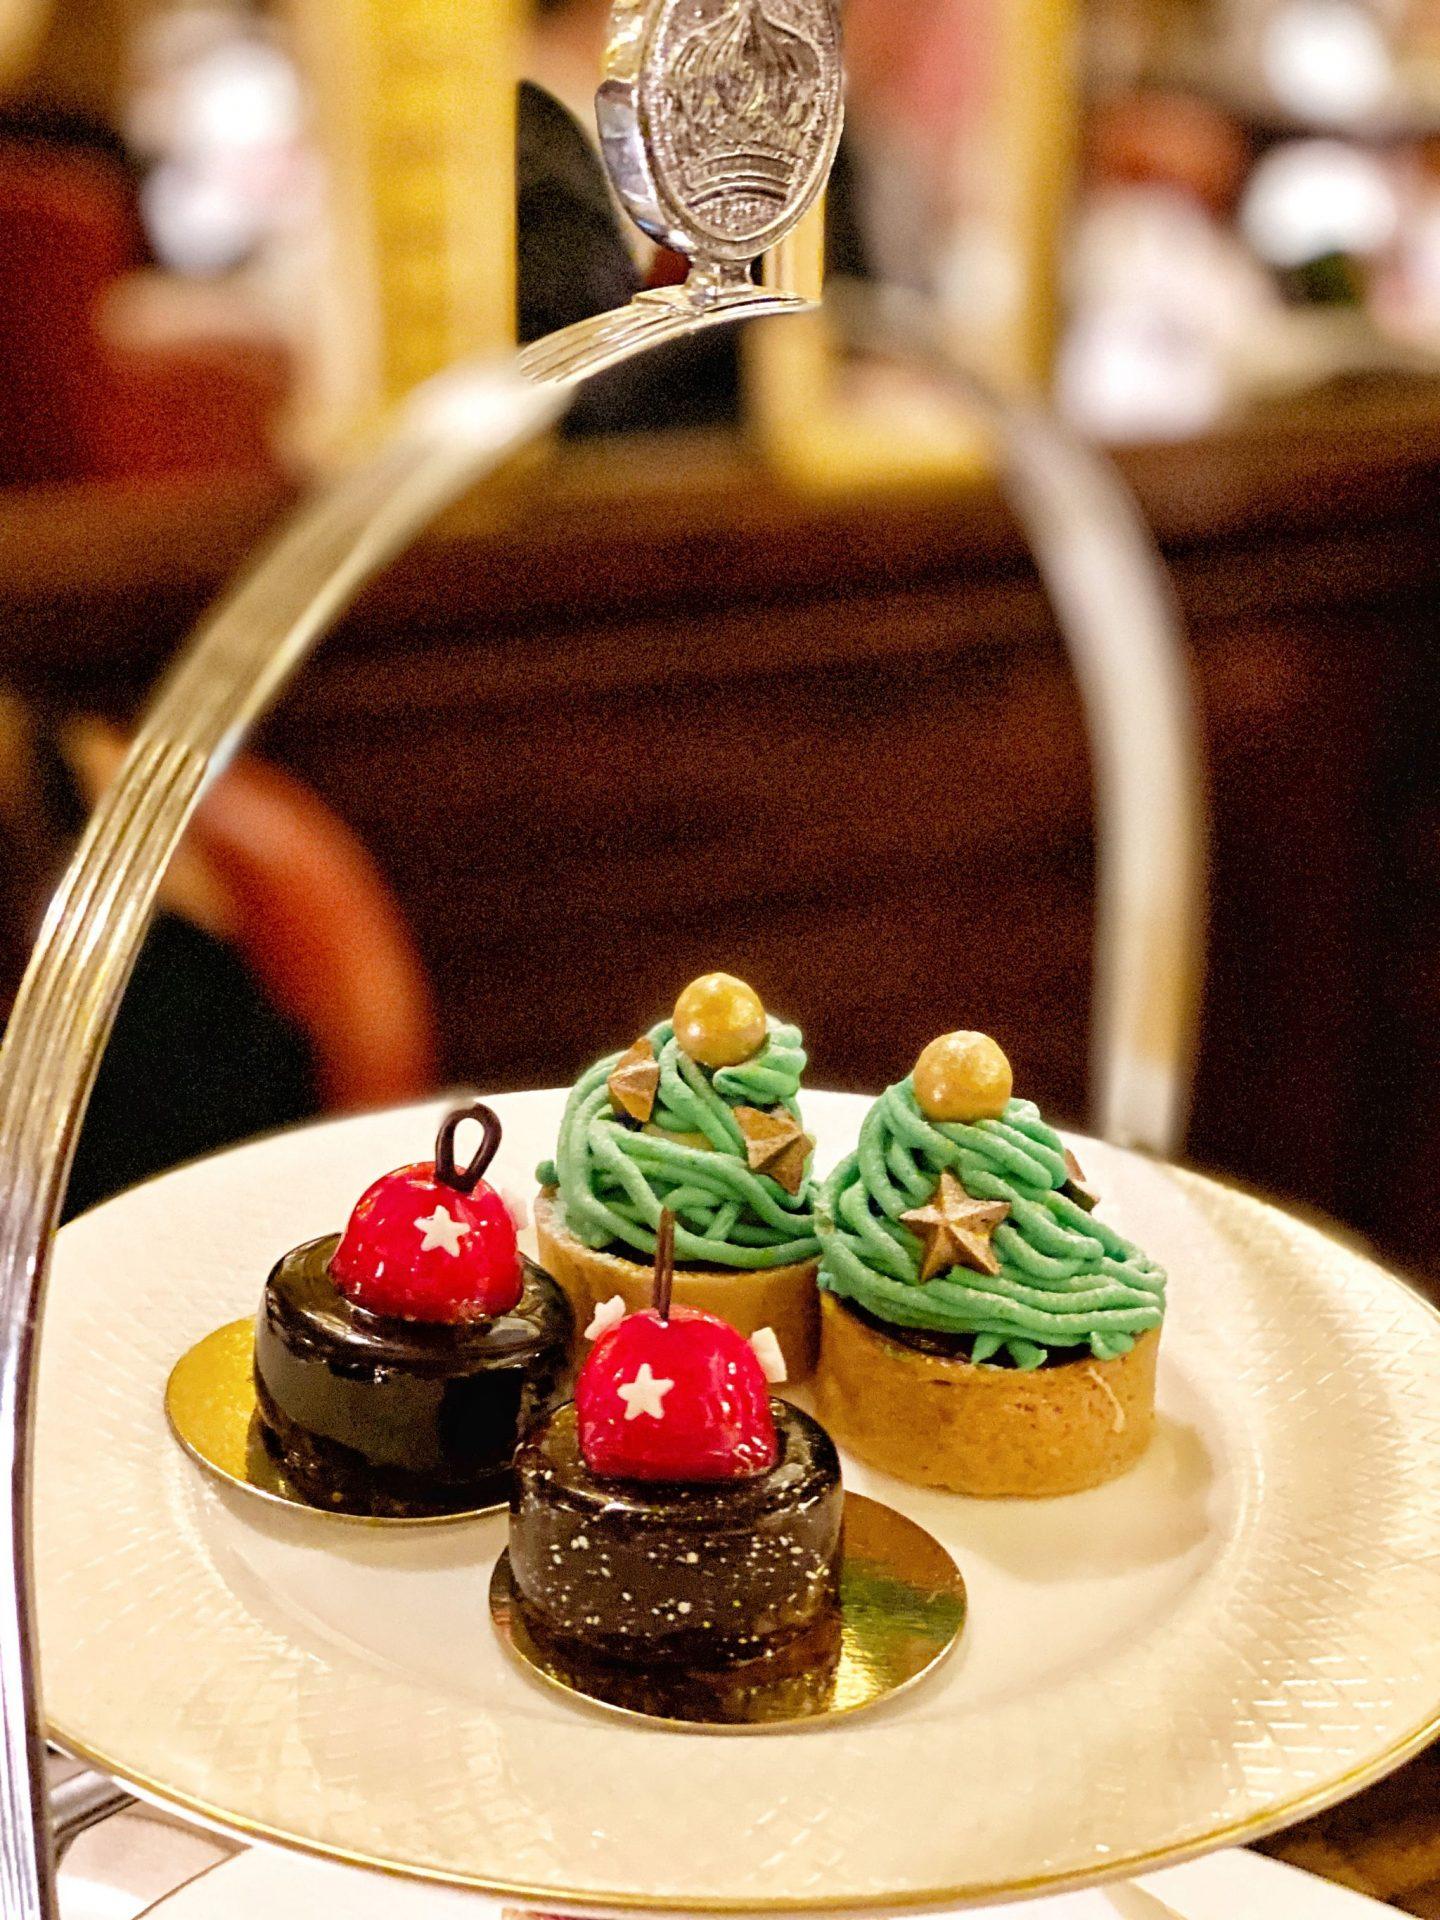 Chocolate and cherry cake and Christmas pudding tart with cinnamon ganache